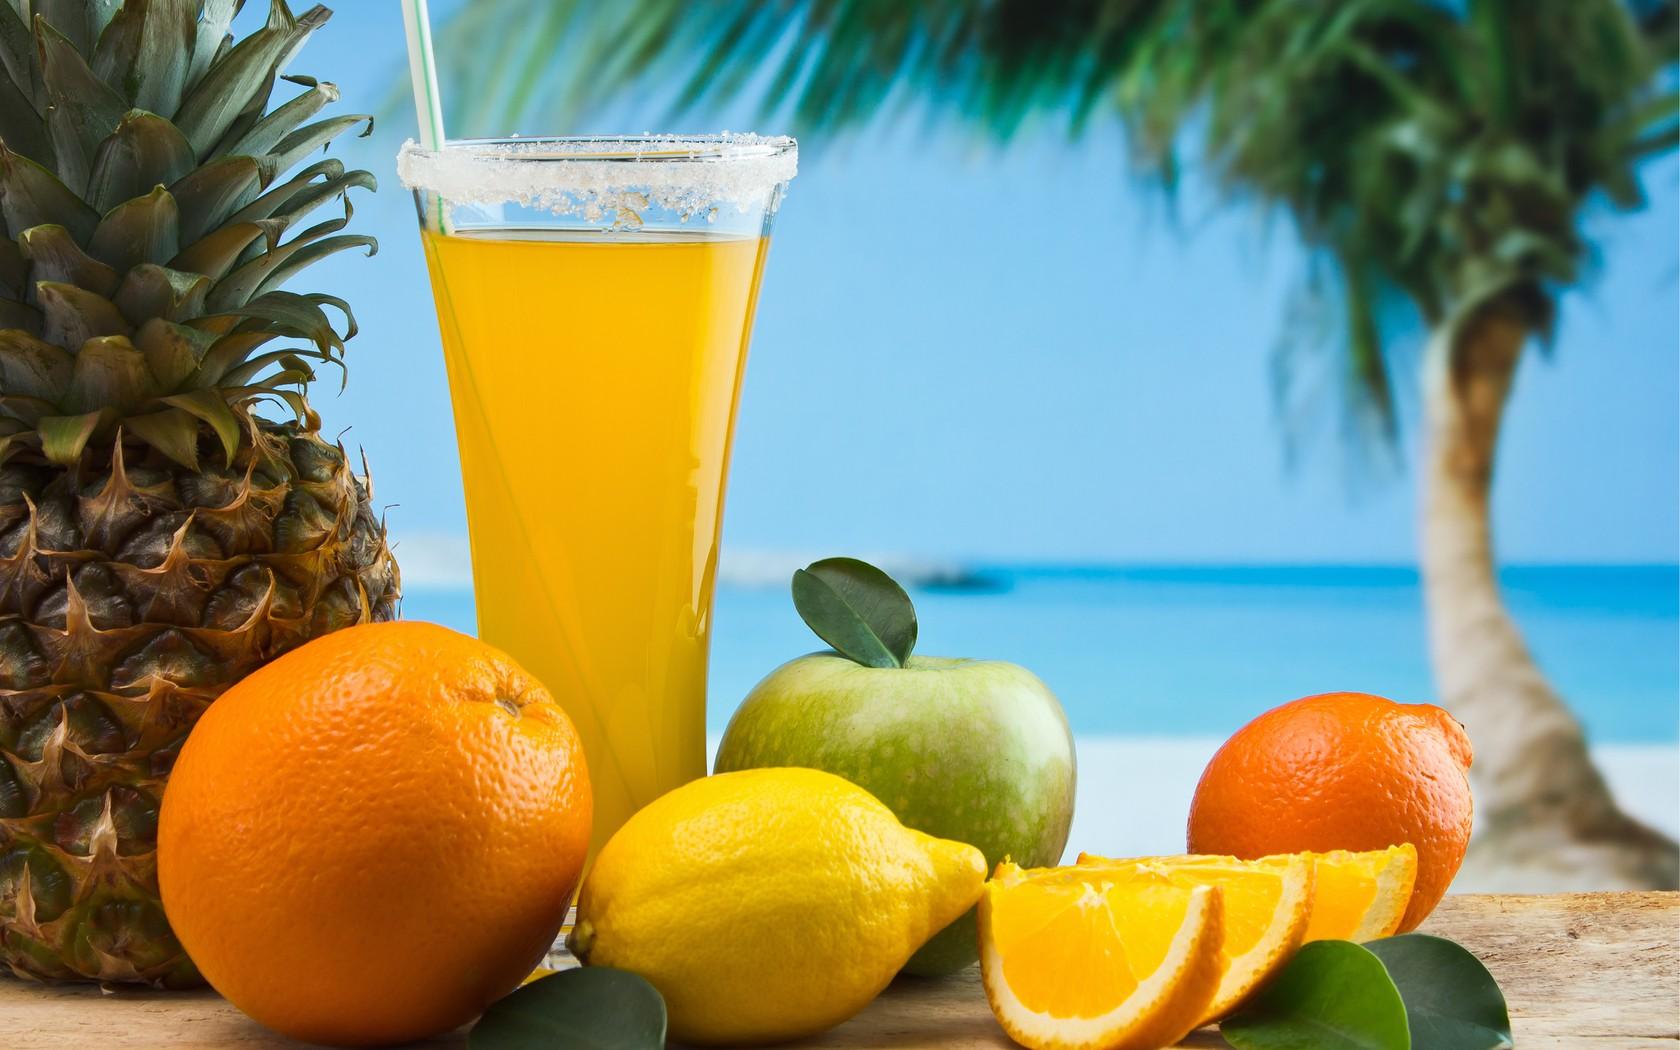 Orange Juice And Fruits Fresh Wallpaper HD Wallpaper WallpaperLepi 1680x1050